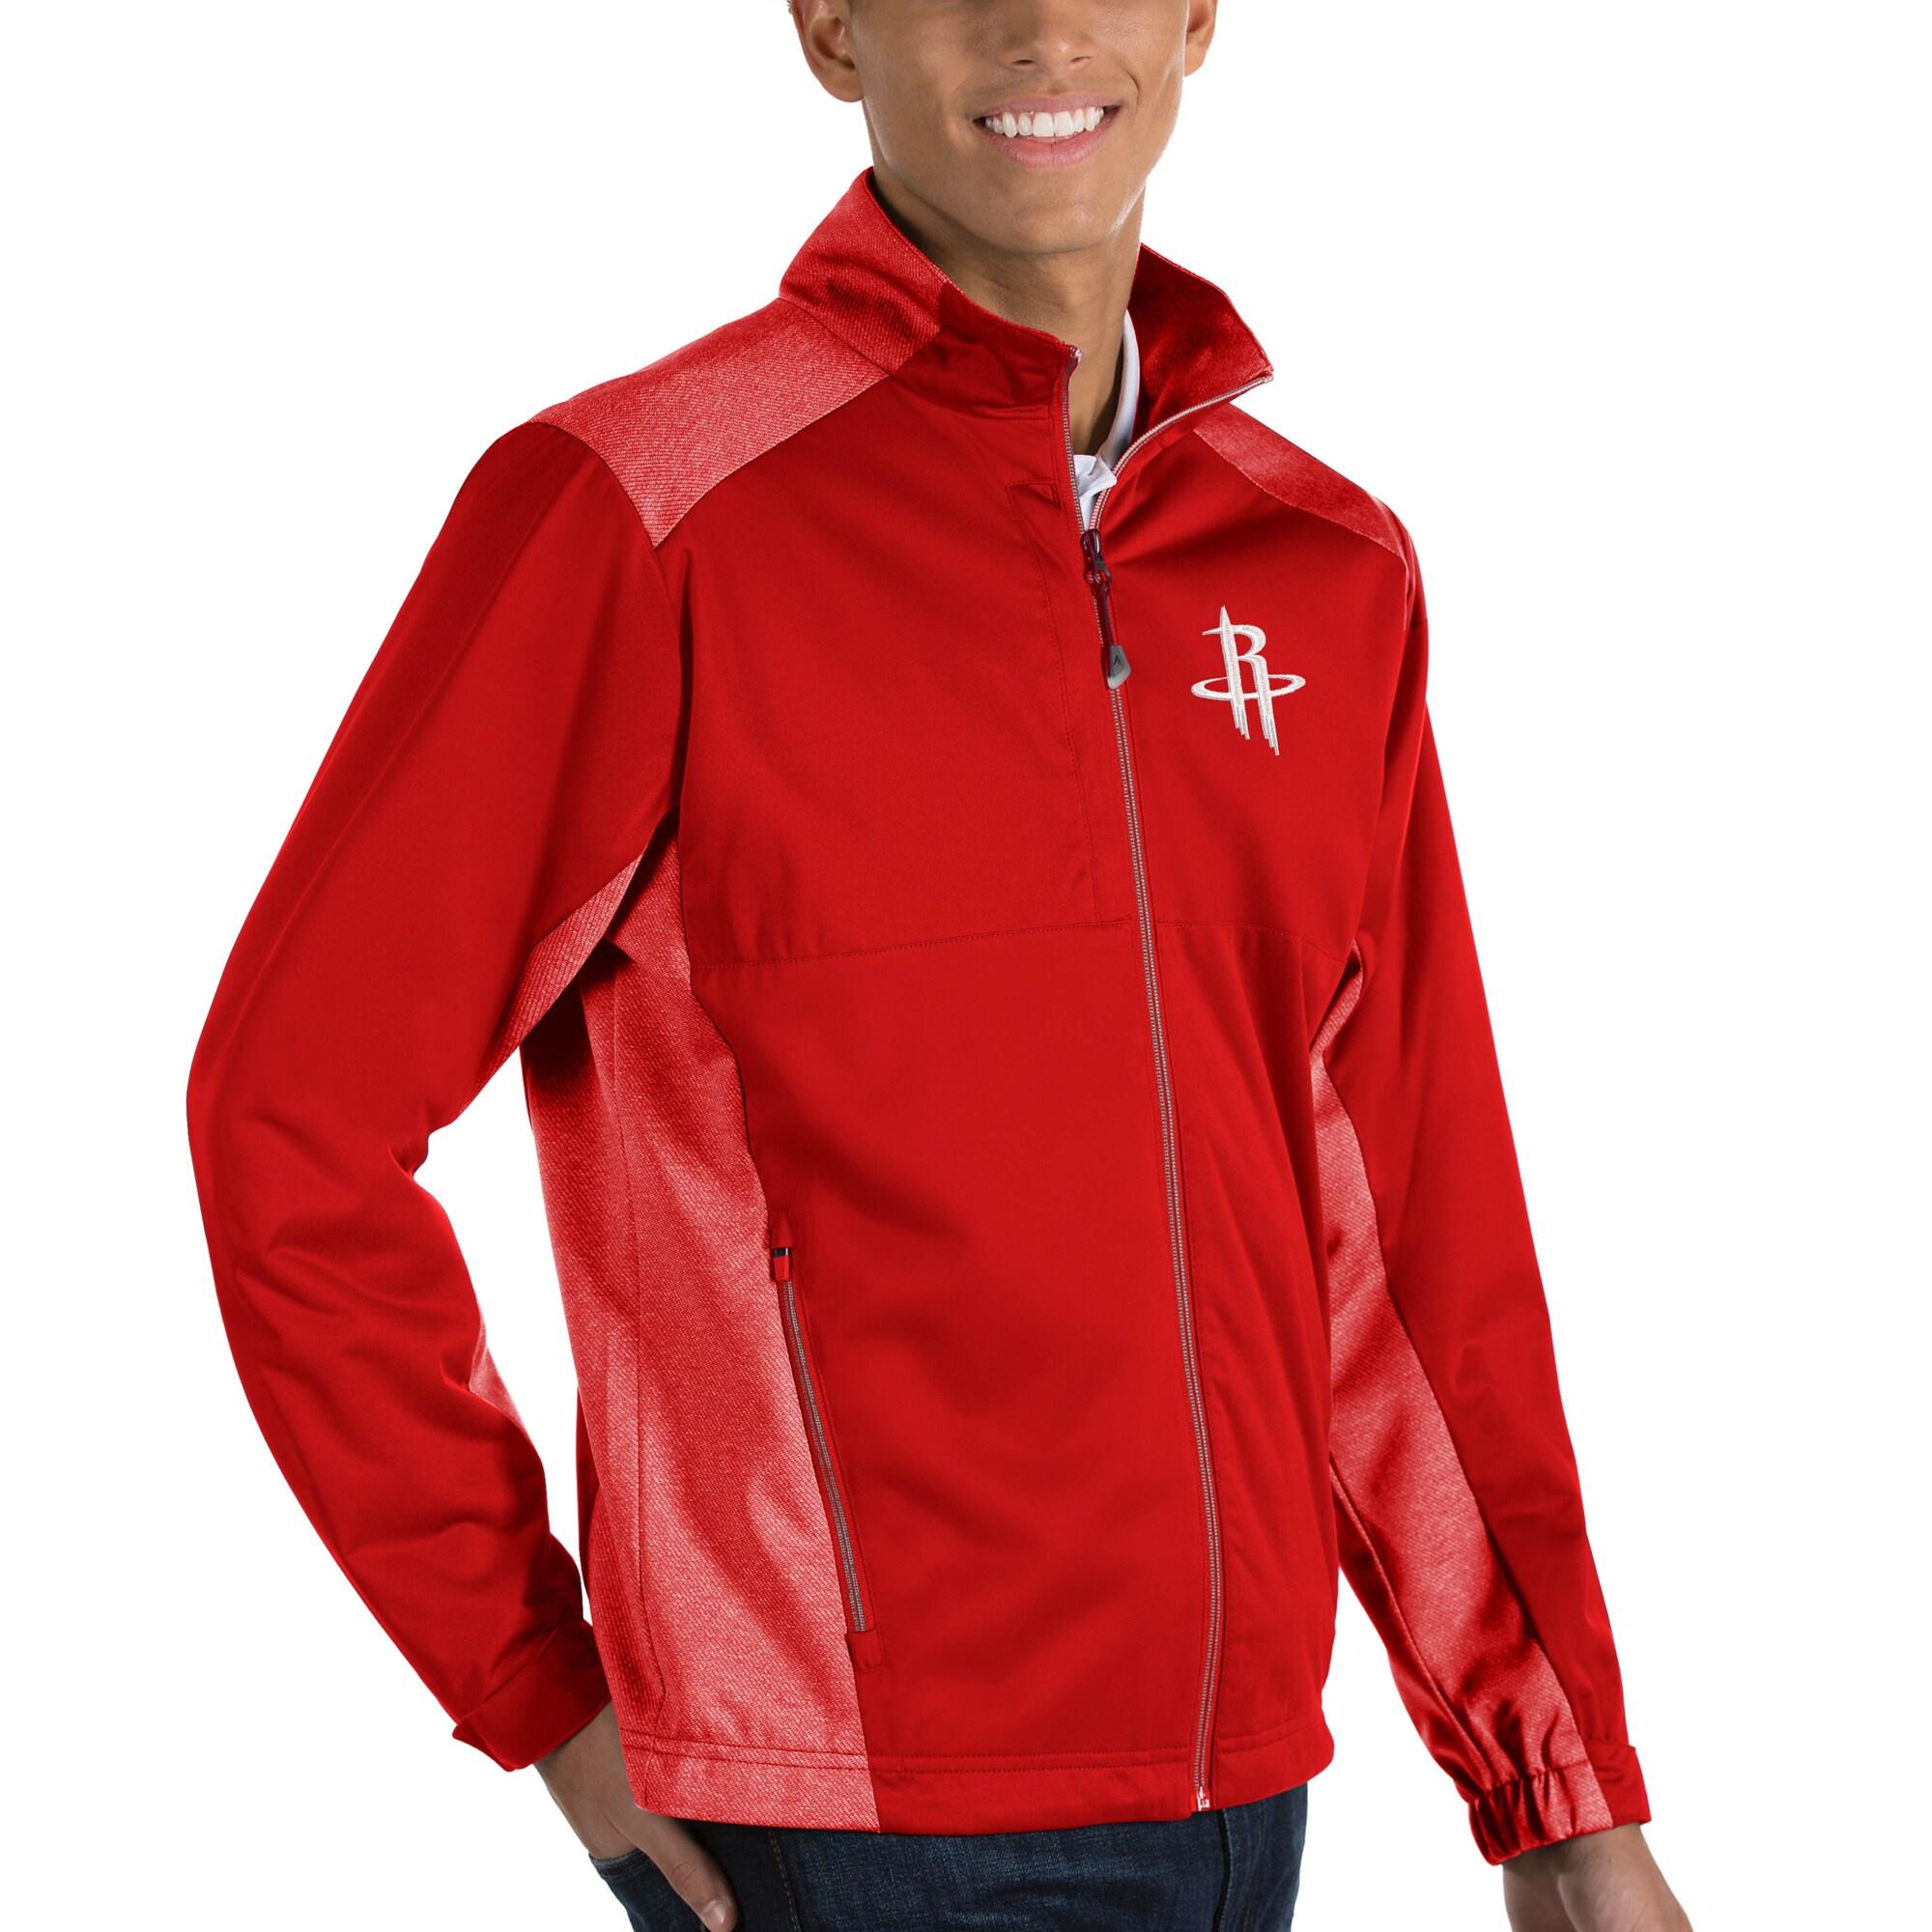 Houston Rockets Antigua Revolve Full-Zip Jacket - Red